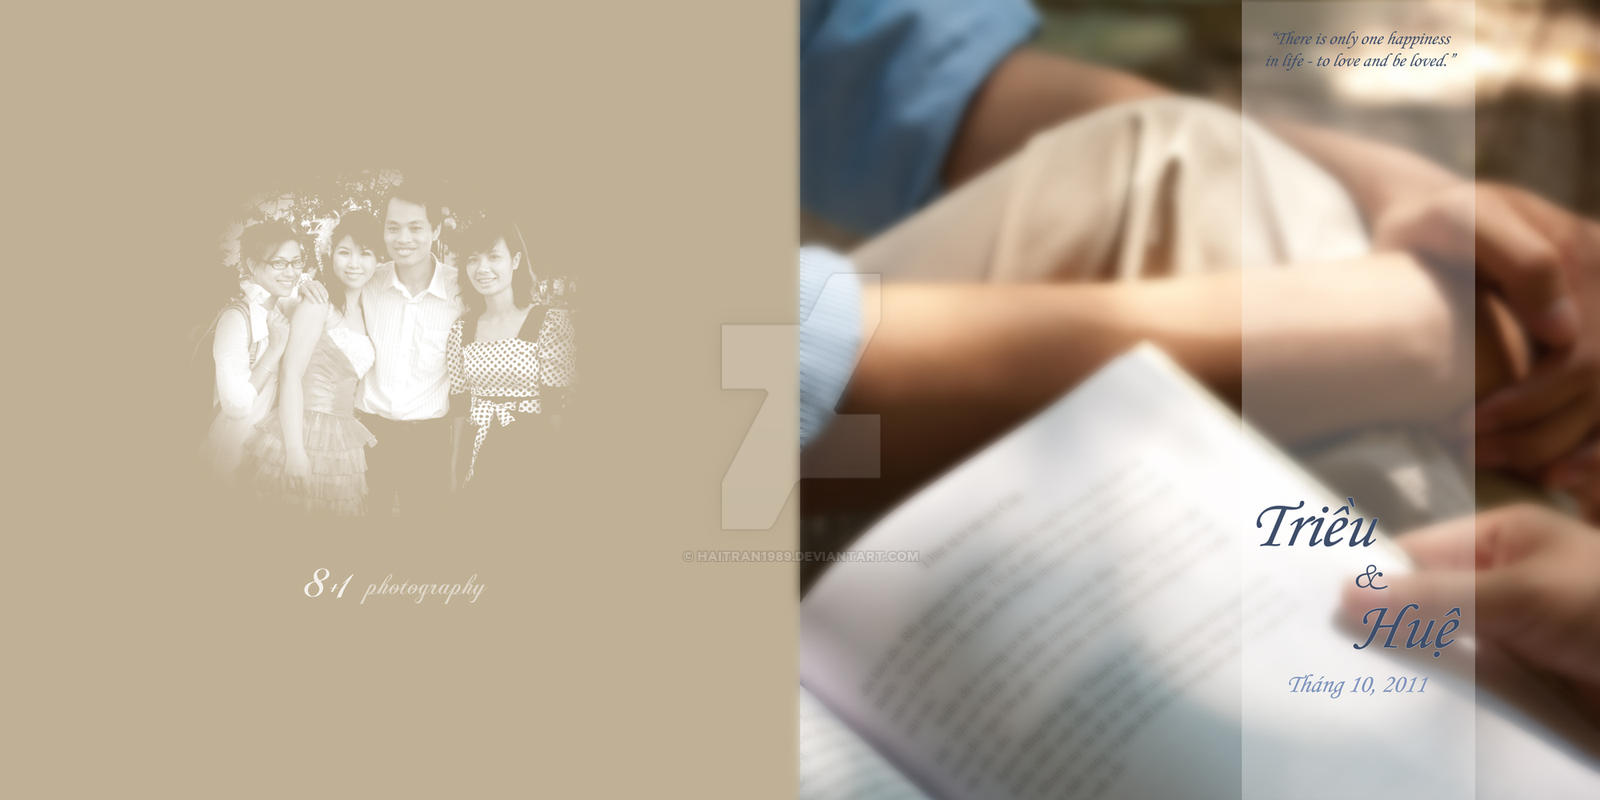 Trieu Hue Pre Wedding Album Cover By Haitran1989